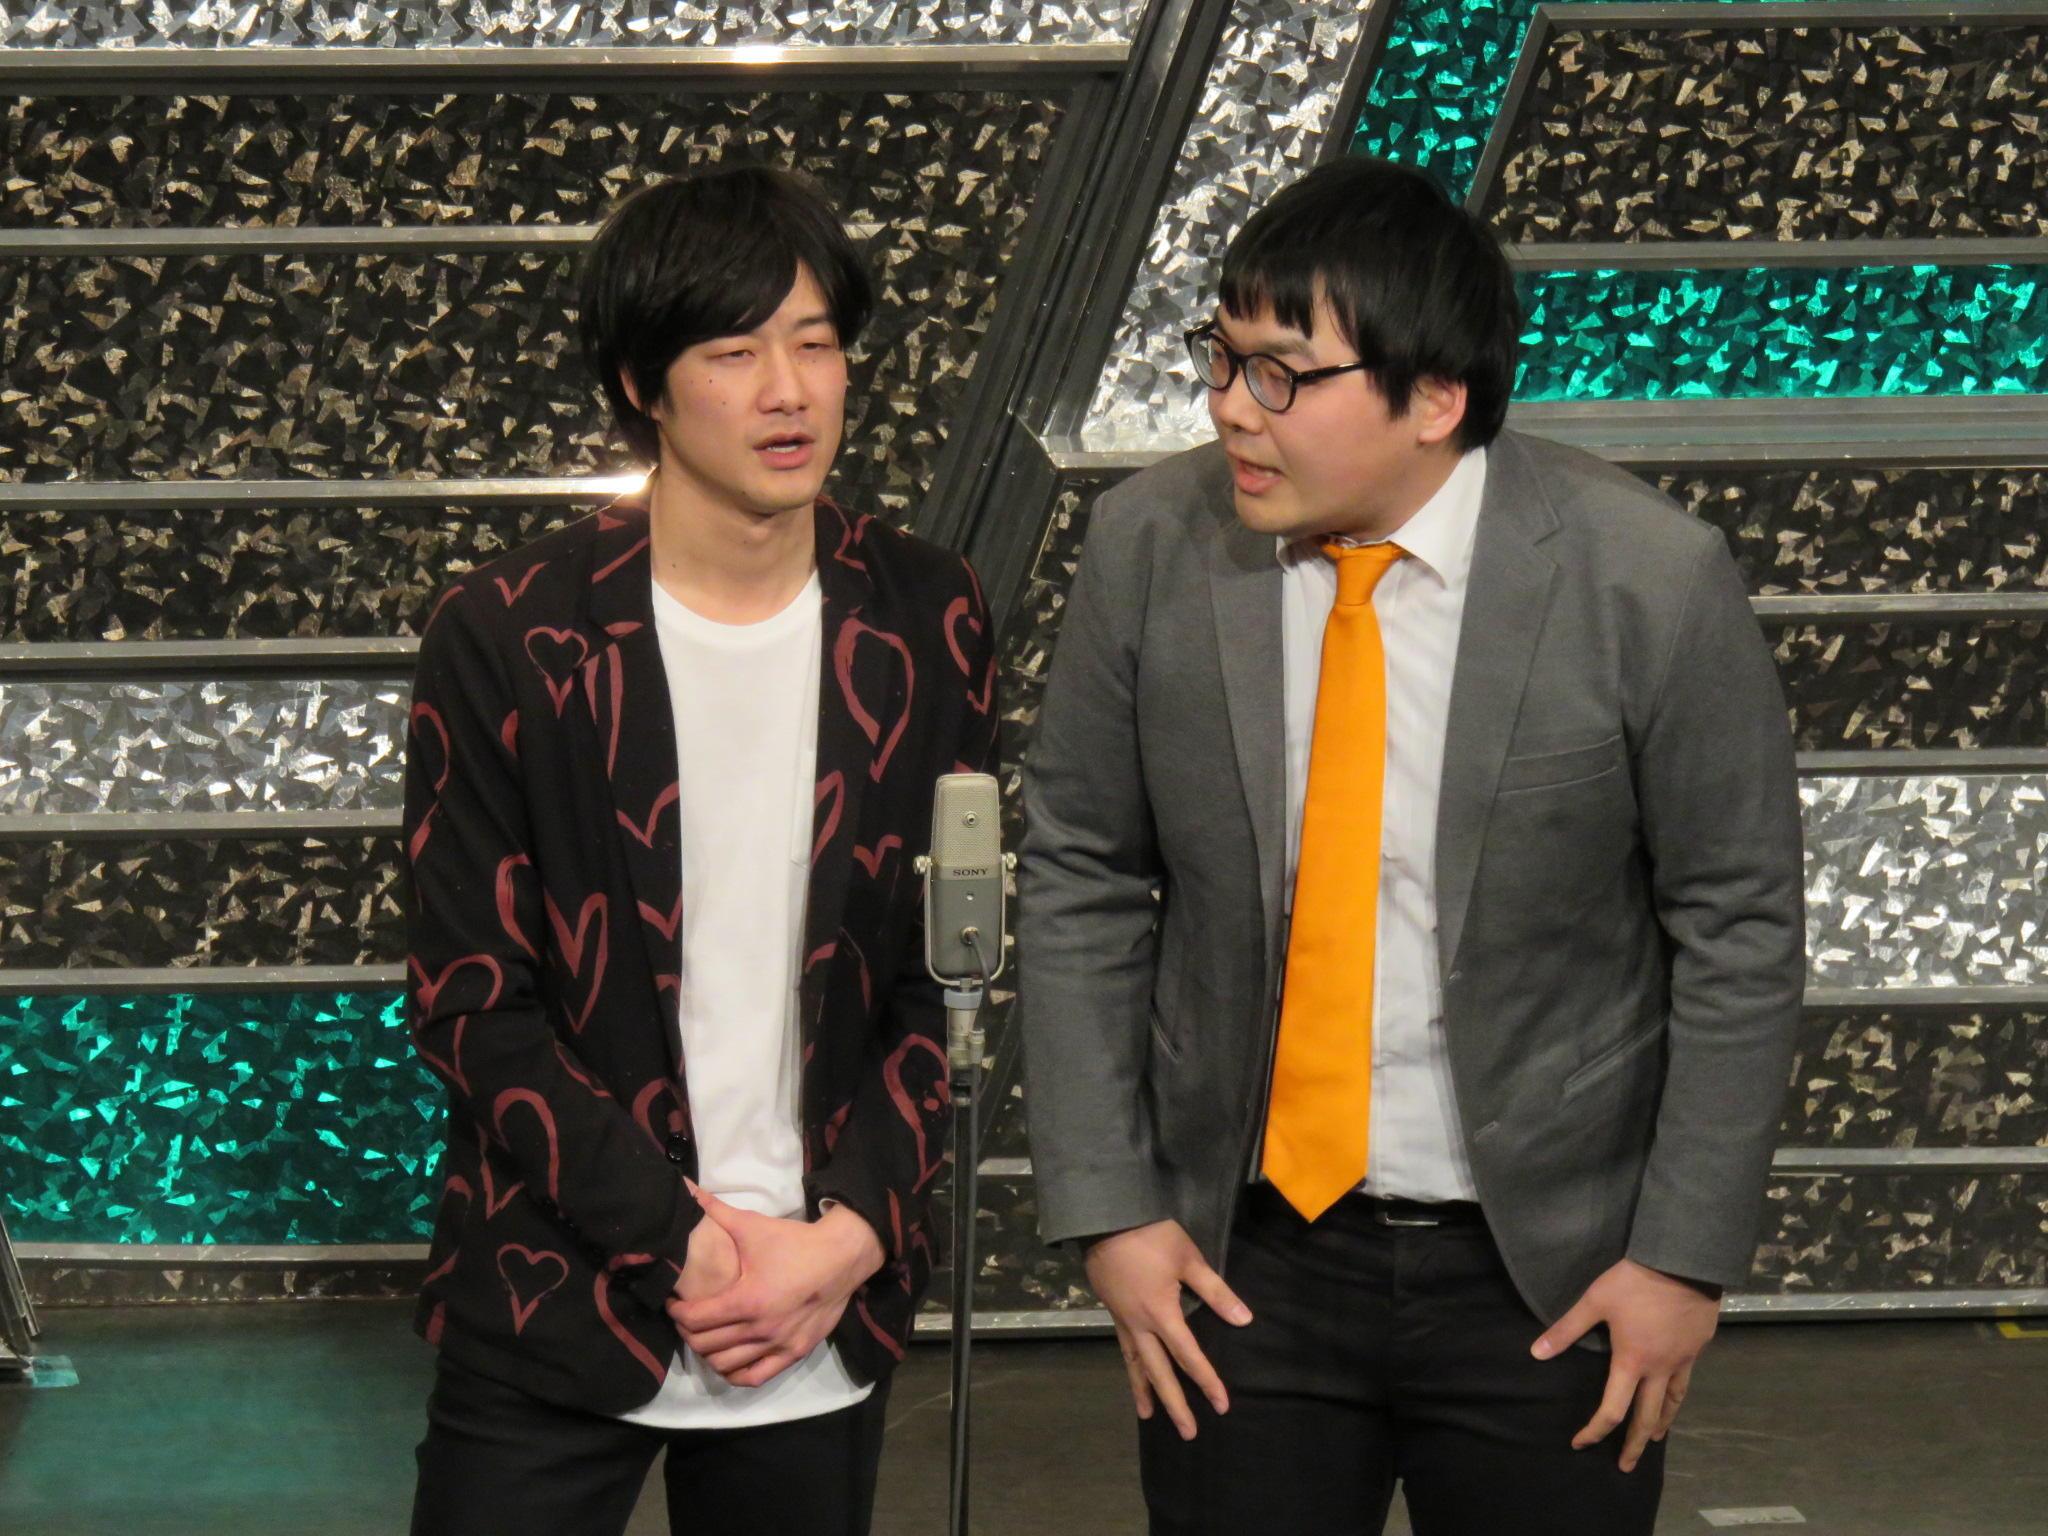 http://news.yoshimoto.co.jp/20160229144020-aff134550147c2059040a0cbac3f2a28f68c3781.jpg